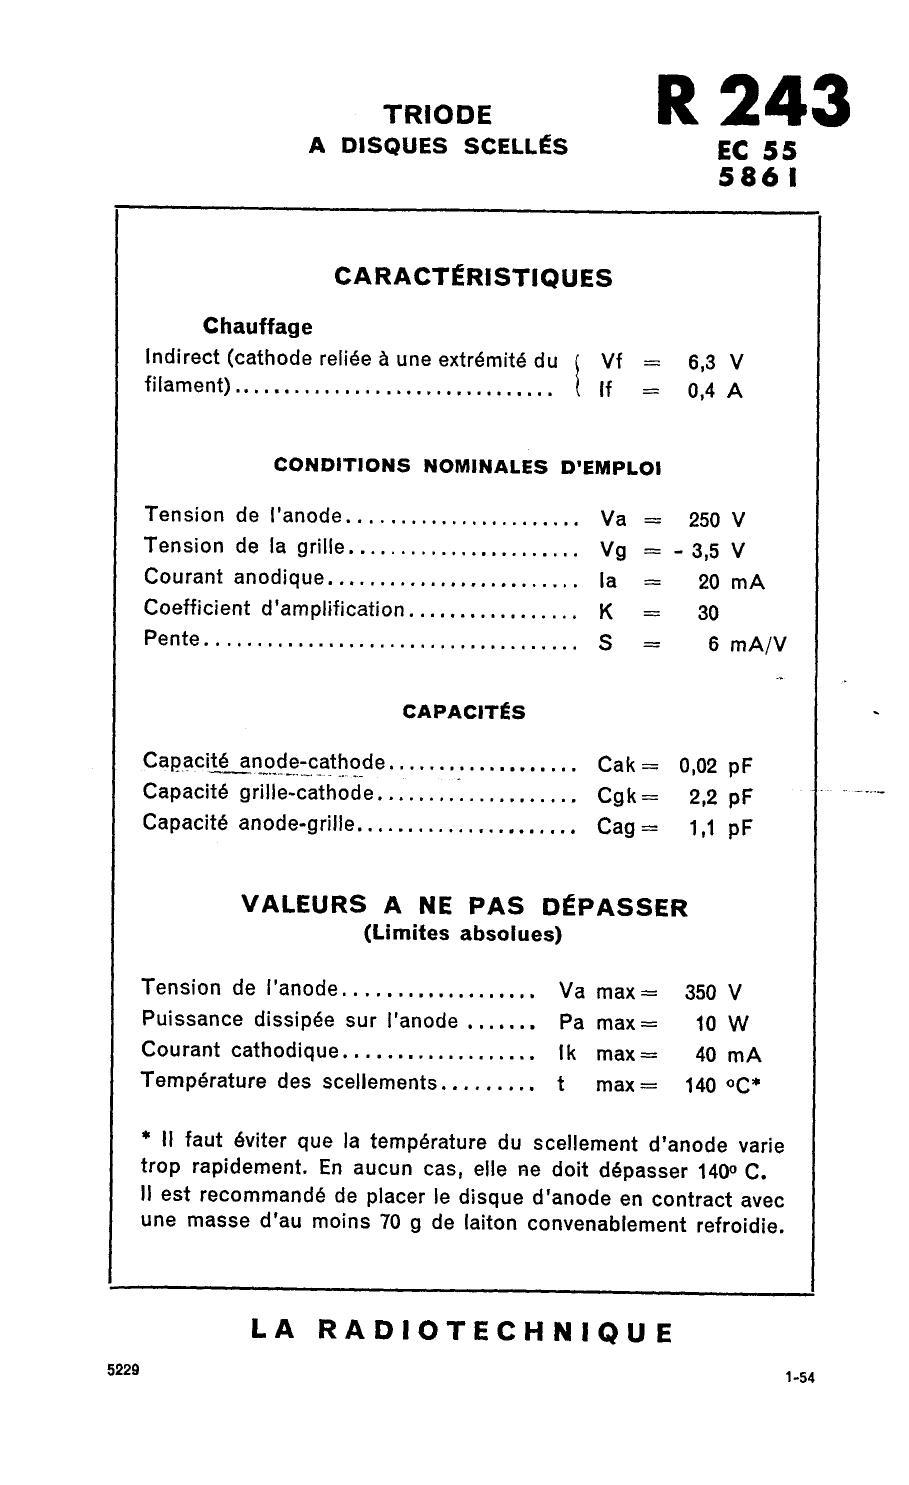 EC55 دیتاشیت PDF